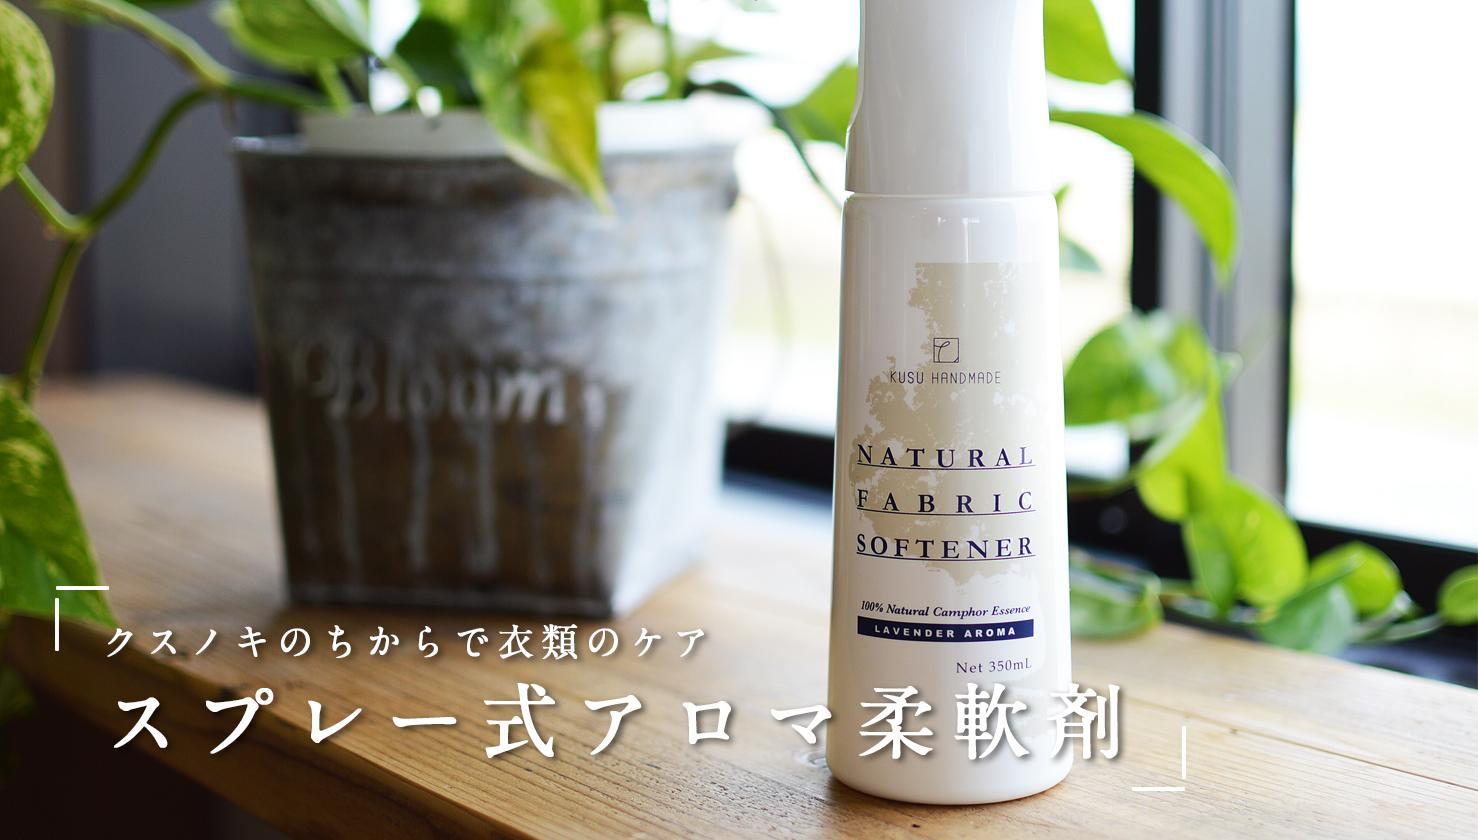 KUSU HANDMADE カンフル&ラベンダー アロマ柔軟仕上げ剤